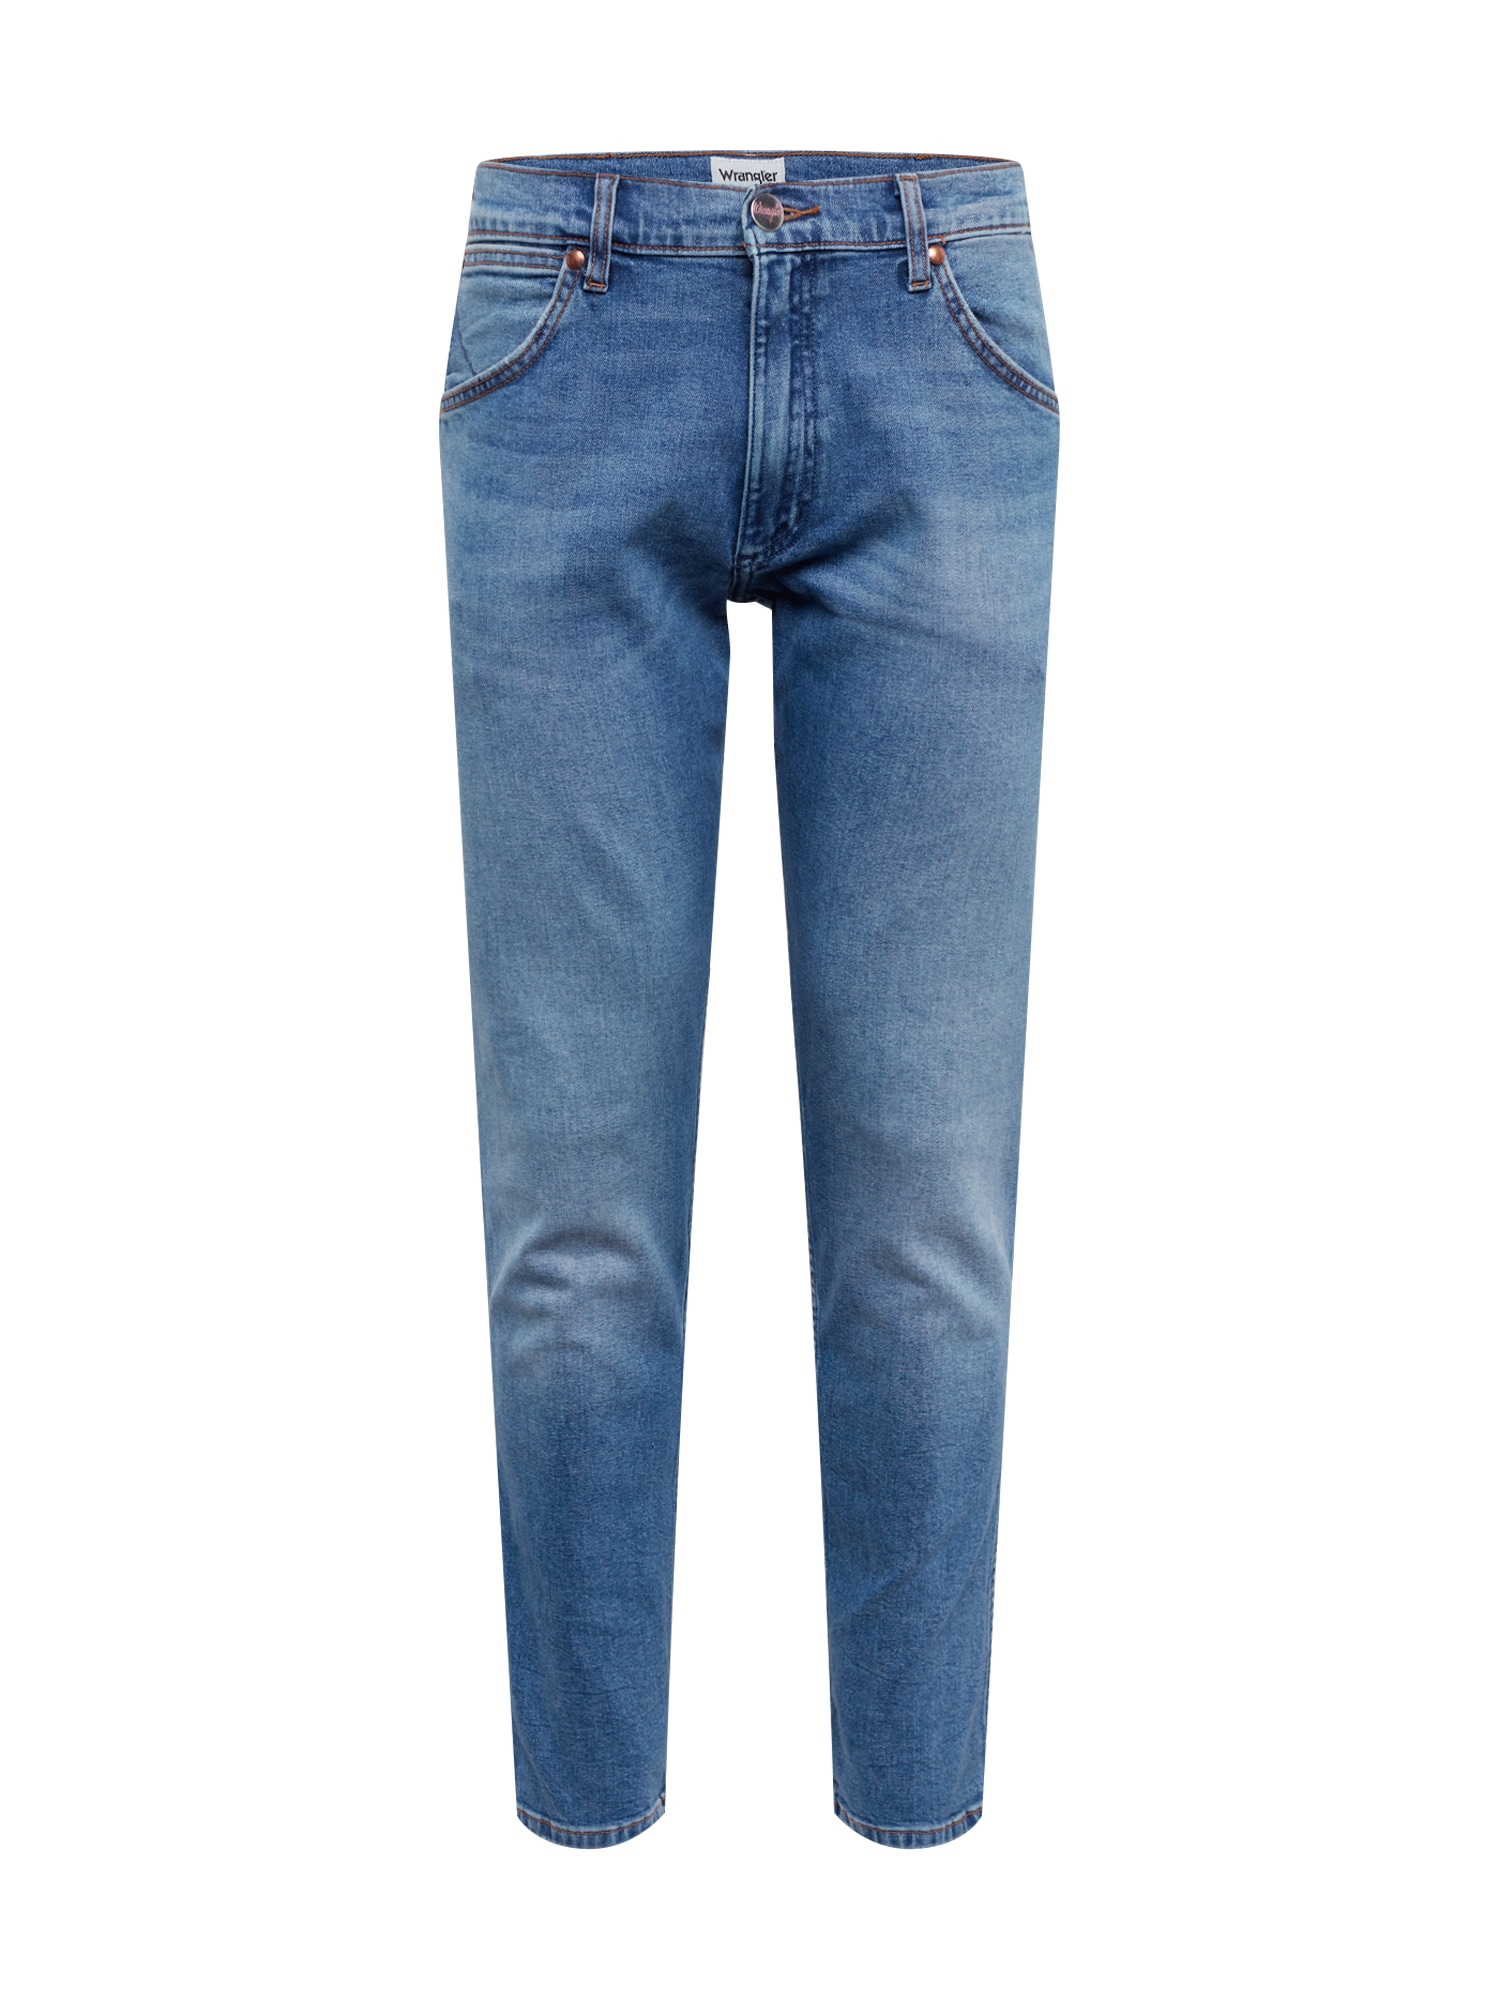 WRANGLER Džinsai '11MWZ' tamsiai (džinso) mėlyna